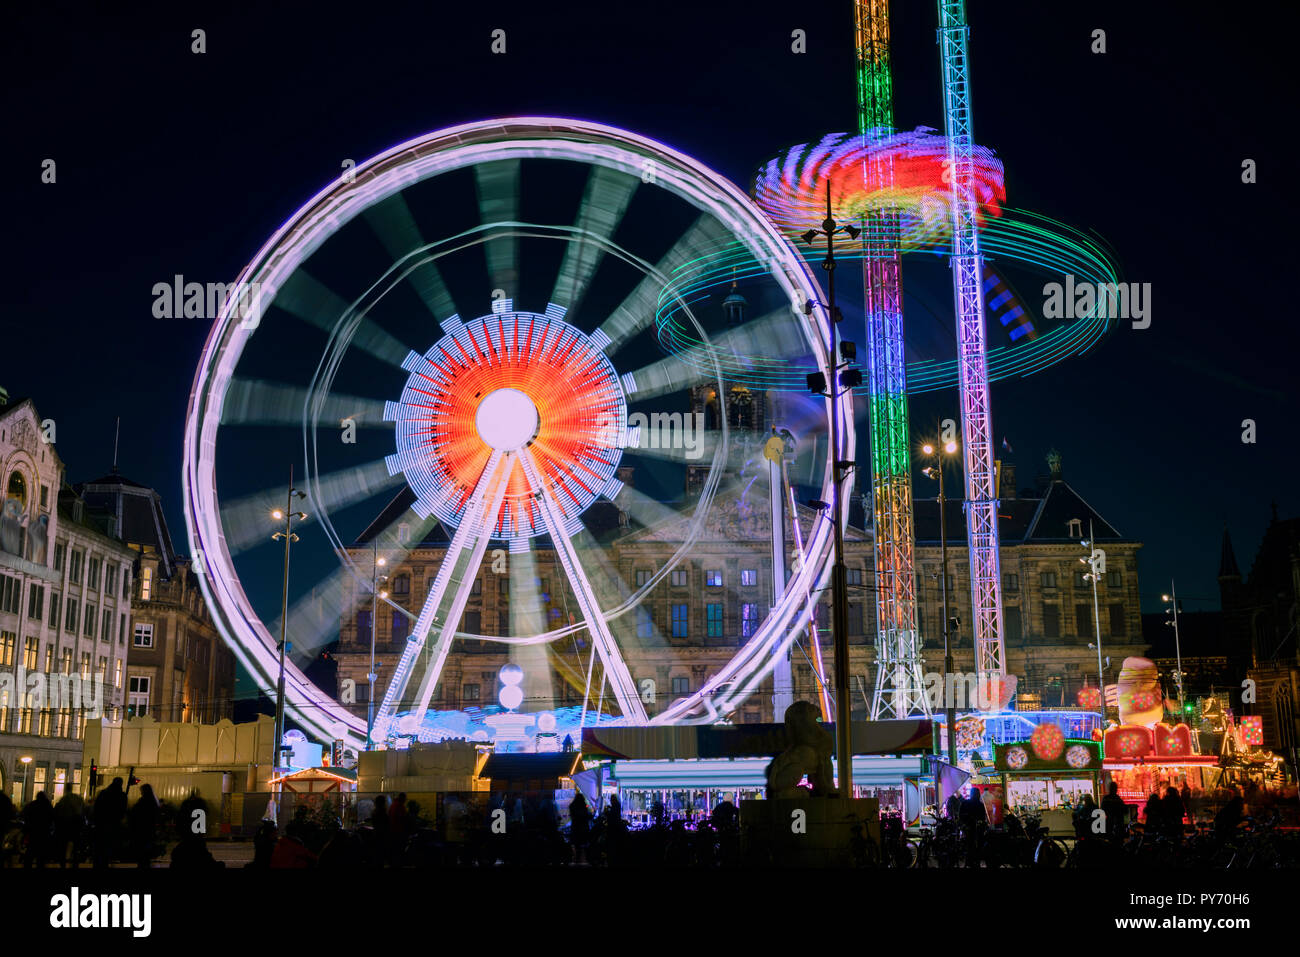 Funfair on Dam Square, Amsterdam, Netherlands Stock Photo